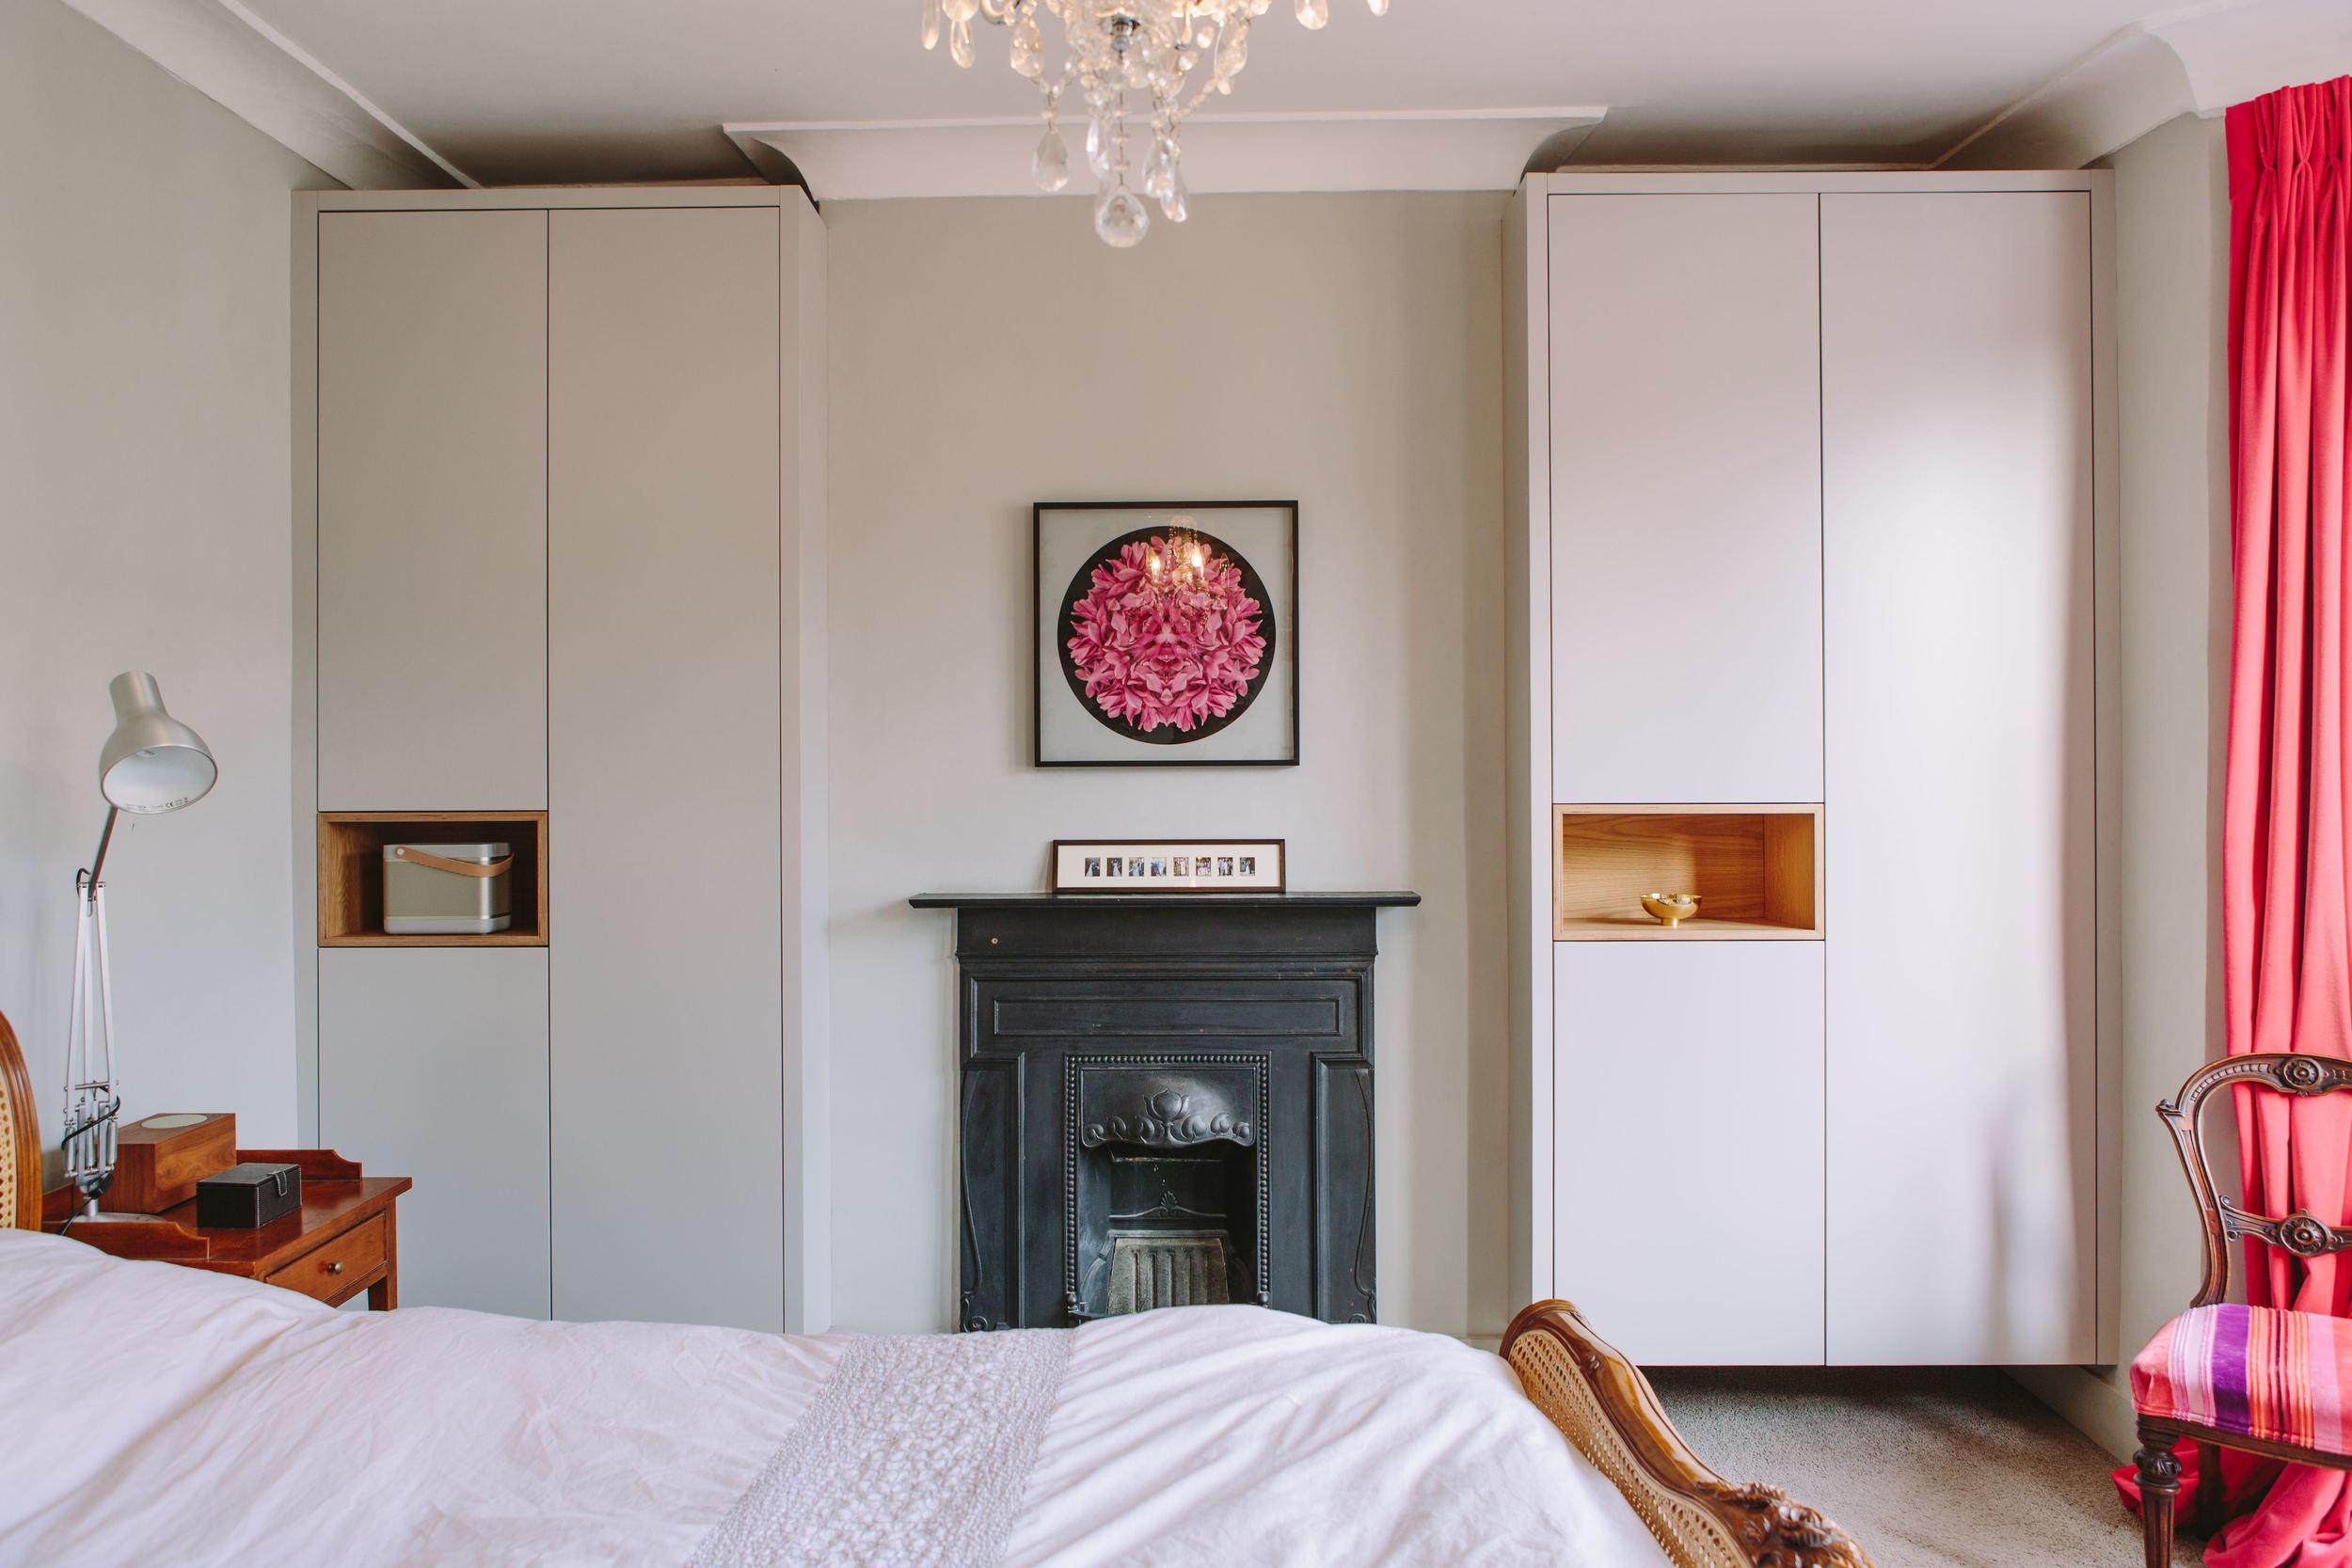 wardrobes, oak veneered plywood, bespoke design, carpentry